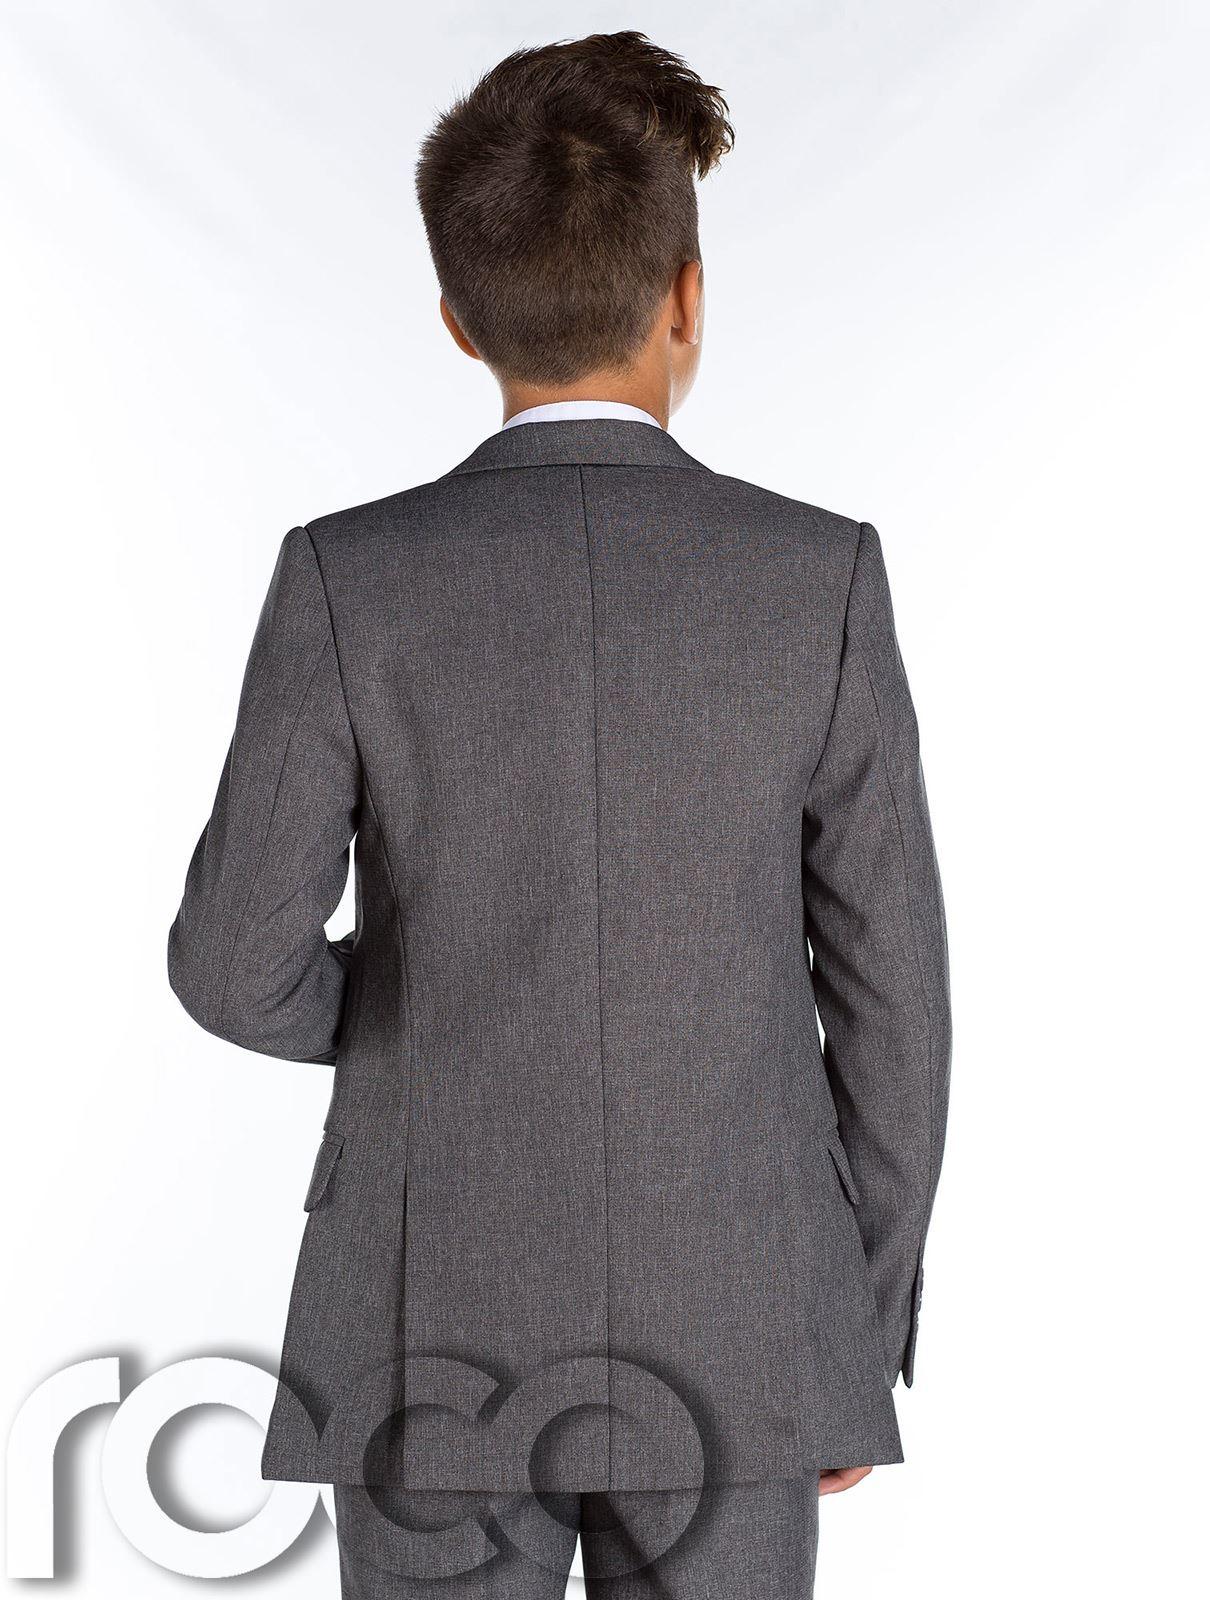 Foulard Uomo Matrimonio : Ragazzi matrimonio abito paggetto da uomo grigio slim foulard